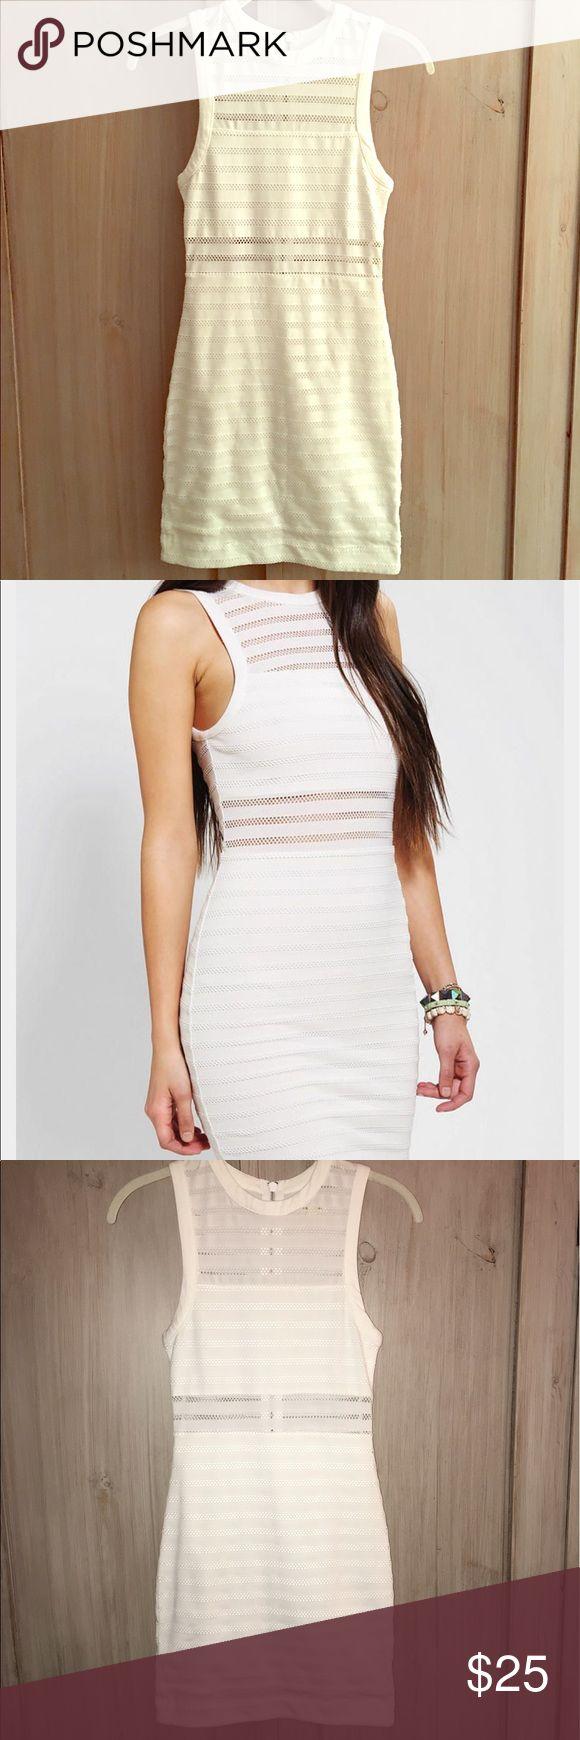 Silence and Noise Illusion Stripe Bodycon Dress XS Urban Outfitters Silence and Noise Illusion Stripe Bodycon Dress in white size xs. Urban Outfitters Dresses Mini